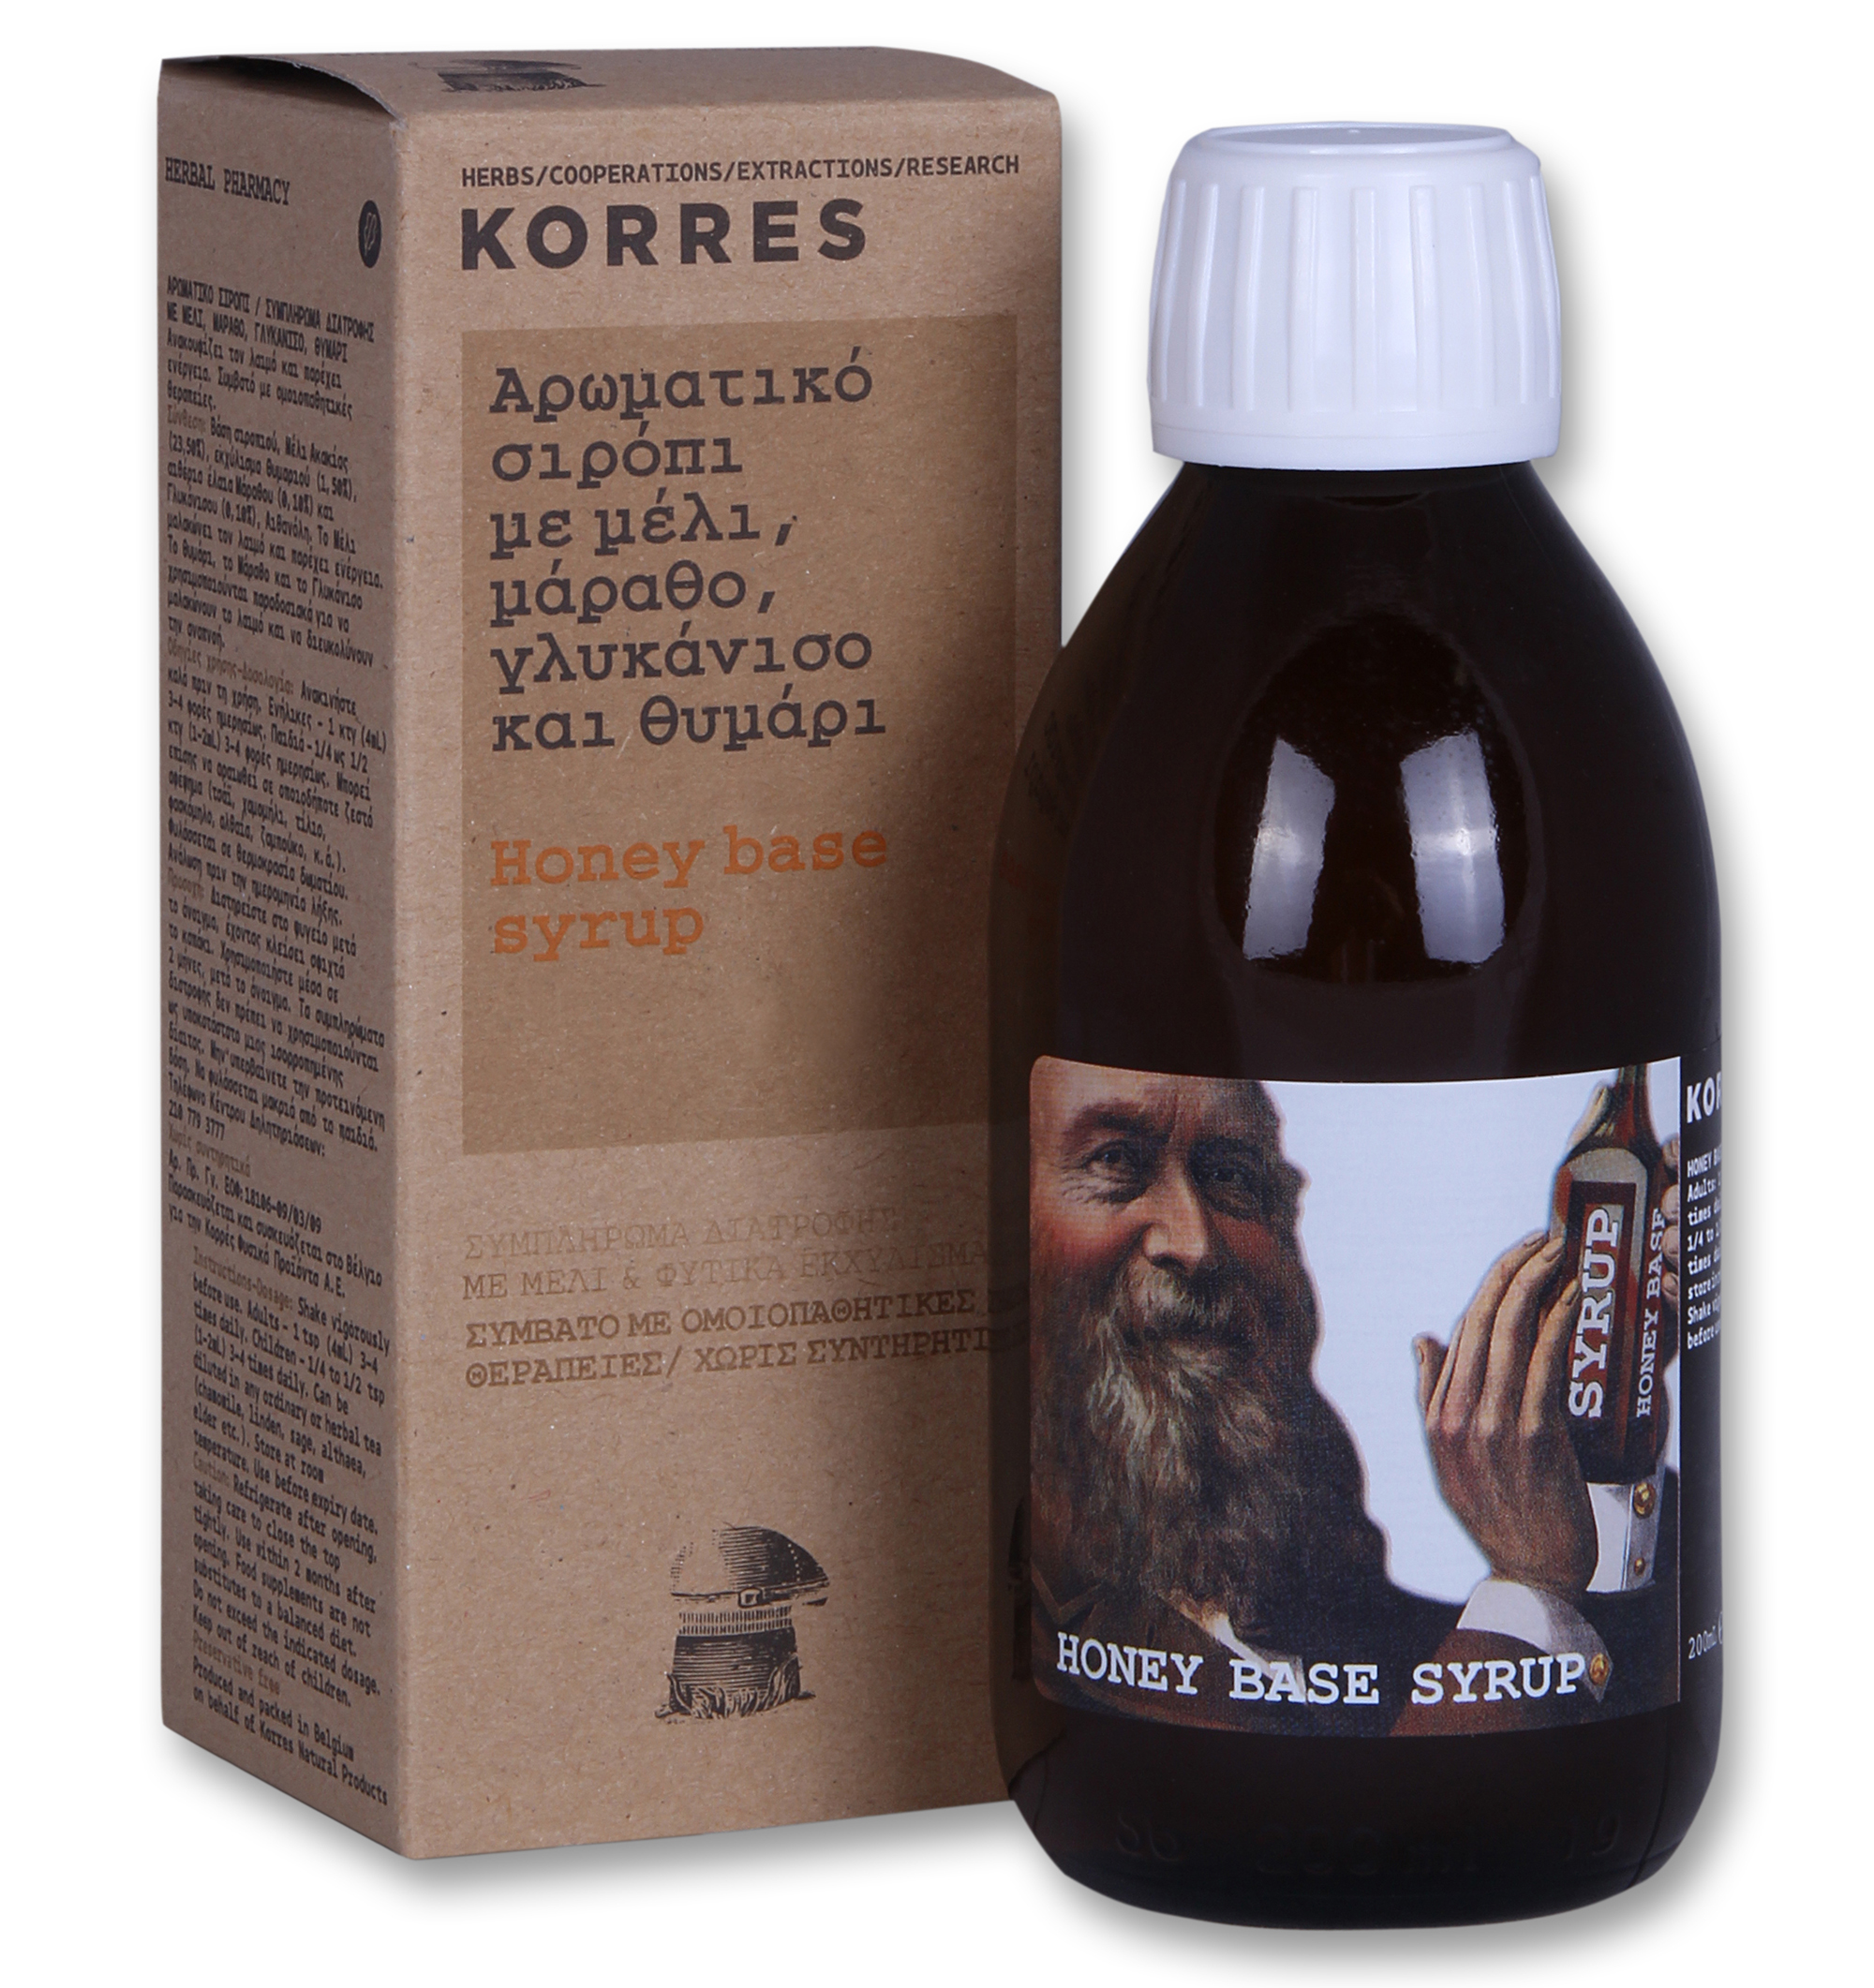 Korres Honey Base SyrupΑρωματικό Σιρόπι με Μέλι, Μάραθο, Γλυκάνικο & Θυμάρι 200ml